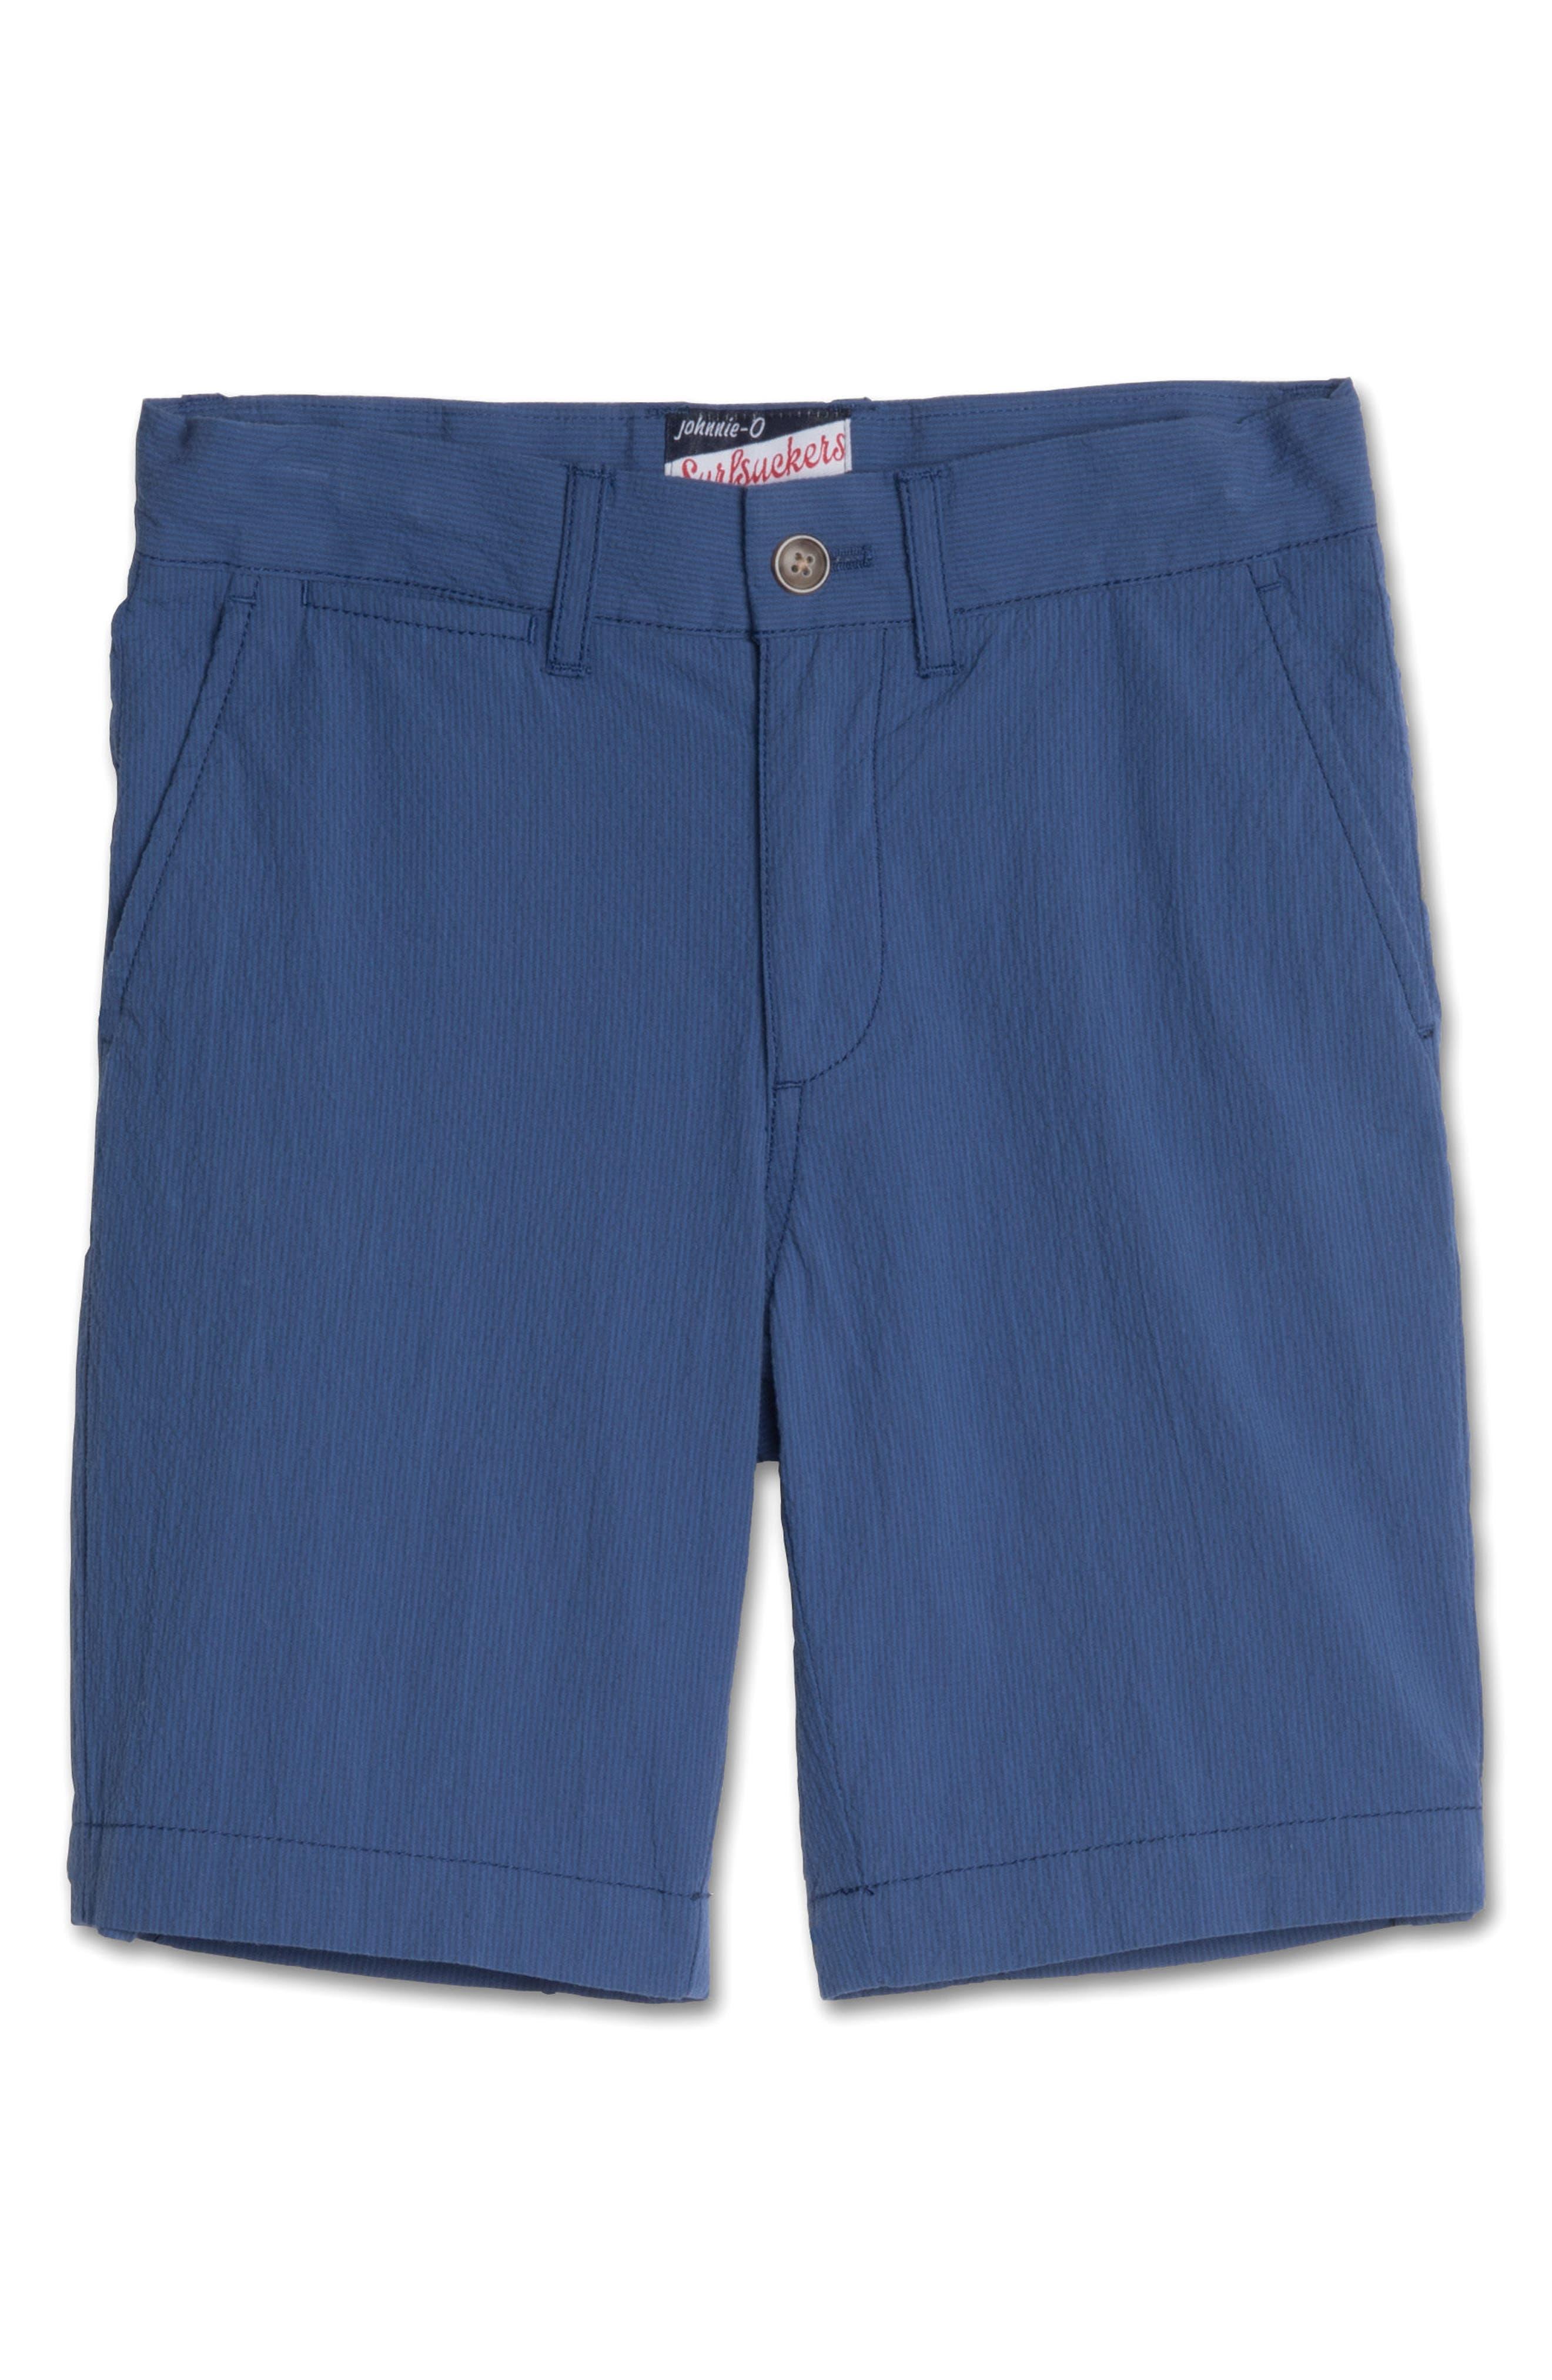 Bryson Seersucker Shorts,                             Main thumbnail 1, color,                             Ripple